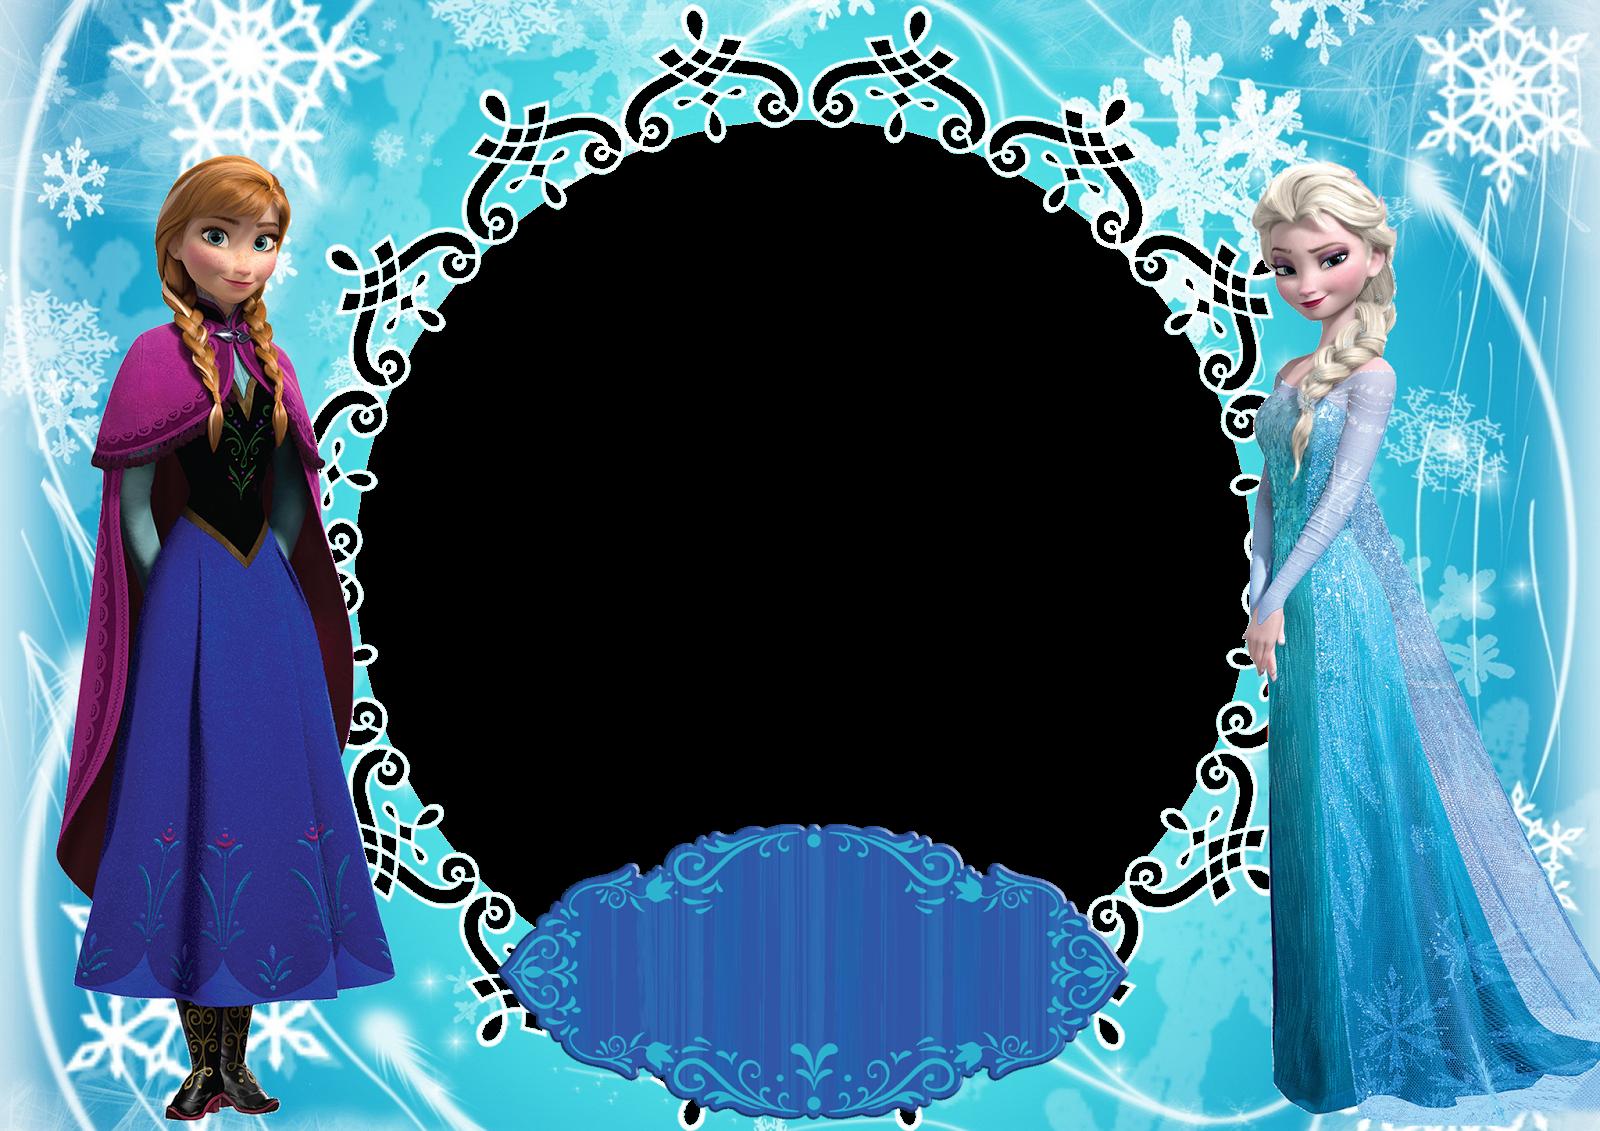 Frozen Olaf Invitations is perfect invitation template